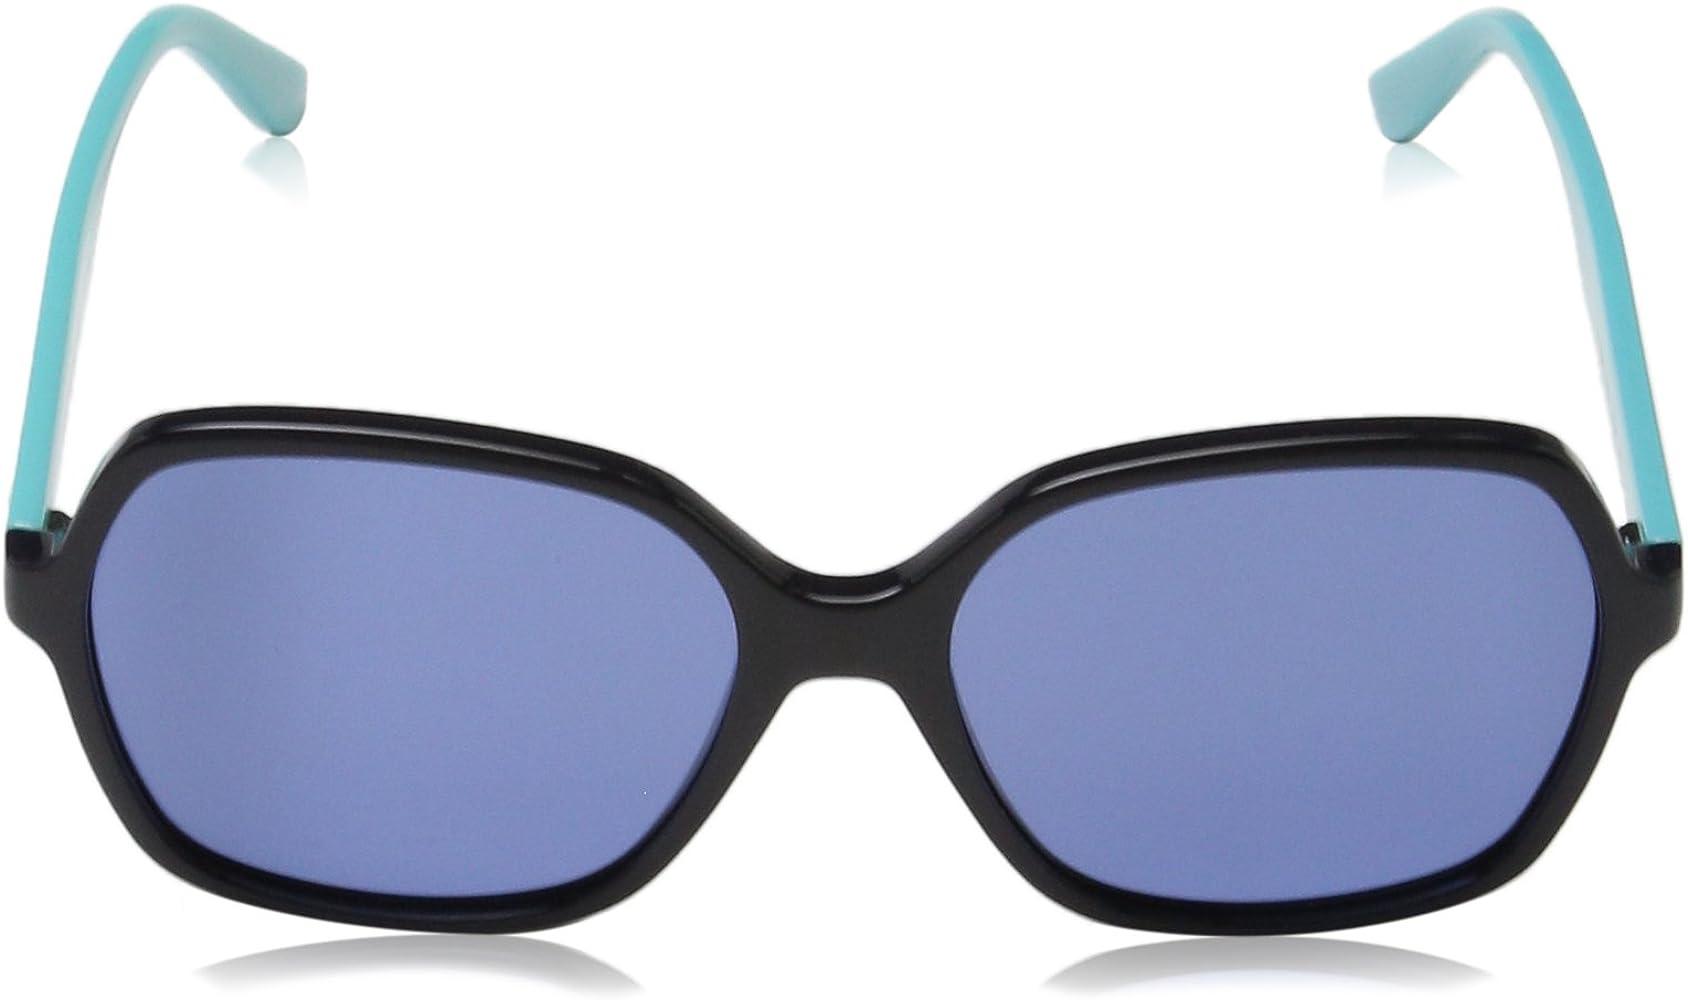 Schwarz Tommy Hilfiger Sonnenbrille TH 1490//S Gafas de sol Negro 57.0 Unisex-Adulto